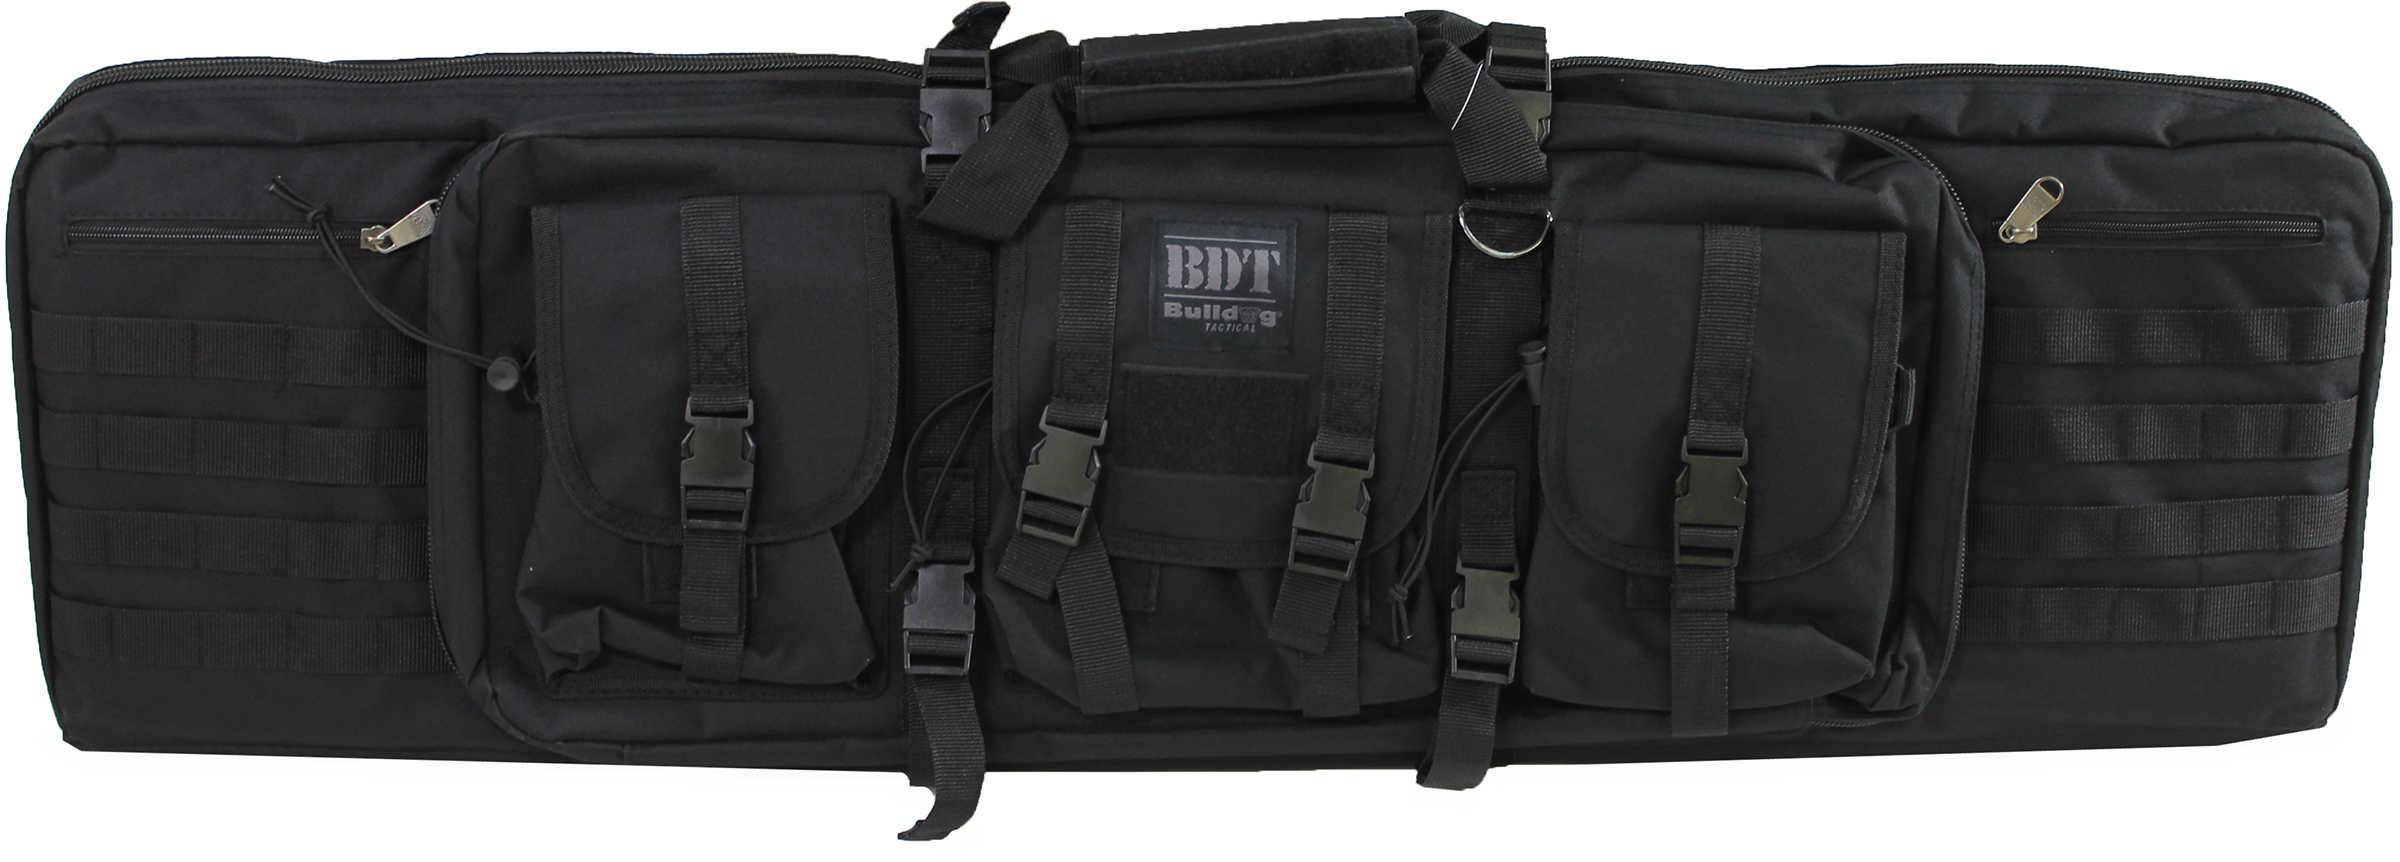 "Bulldog Cases Tactical Double Rifle Case Black Nylon 43"" BDT60-43B"